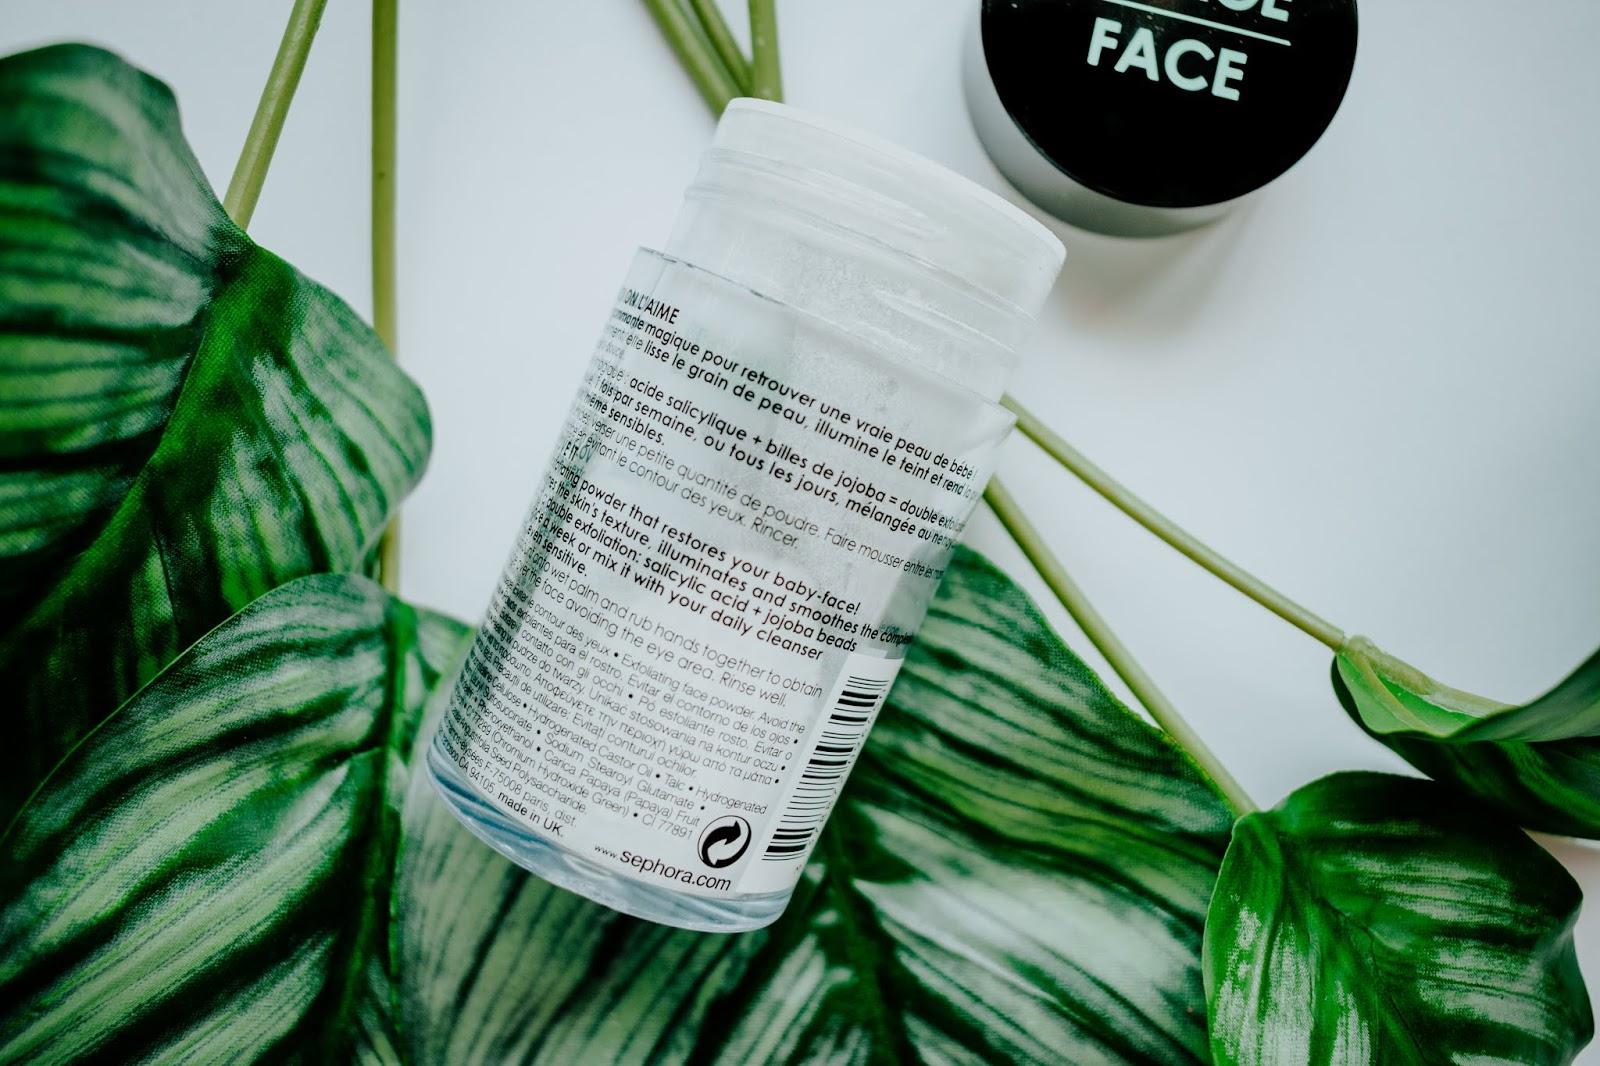 Metamophosis Exfoliating Powder Sephora exfoliante facial polvo 3